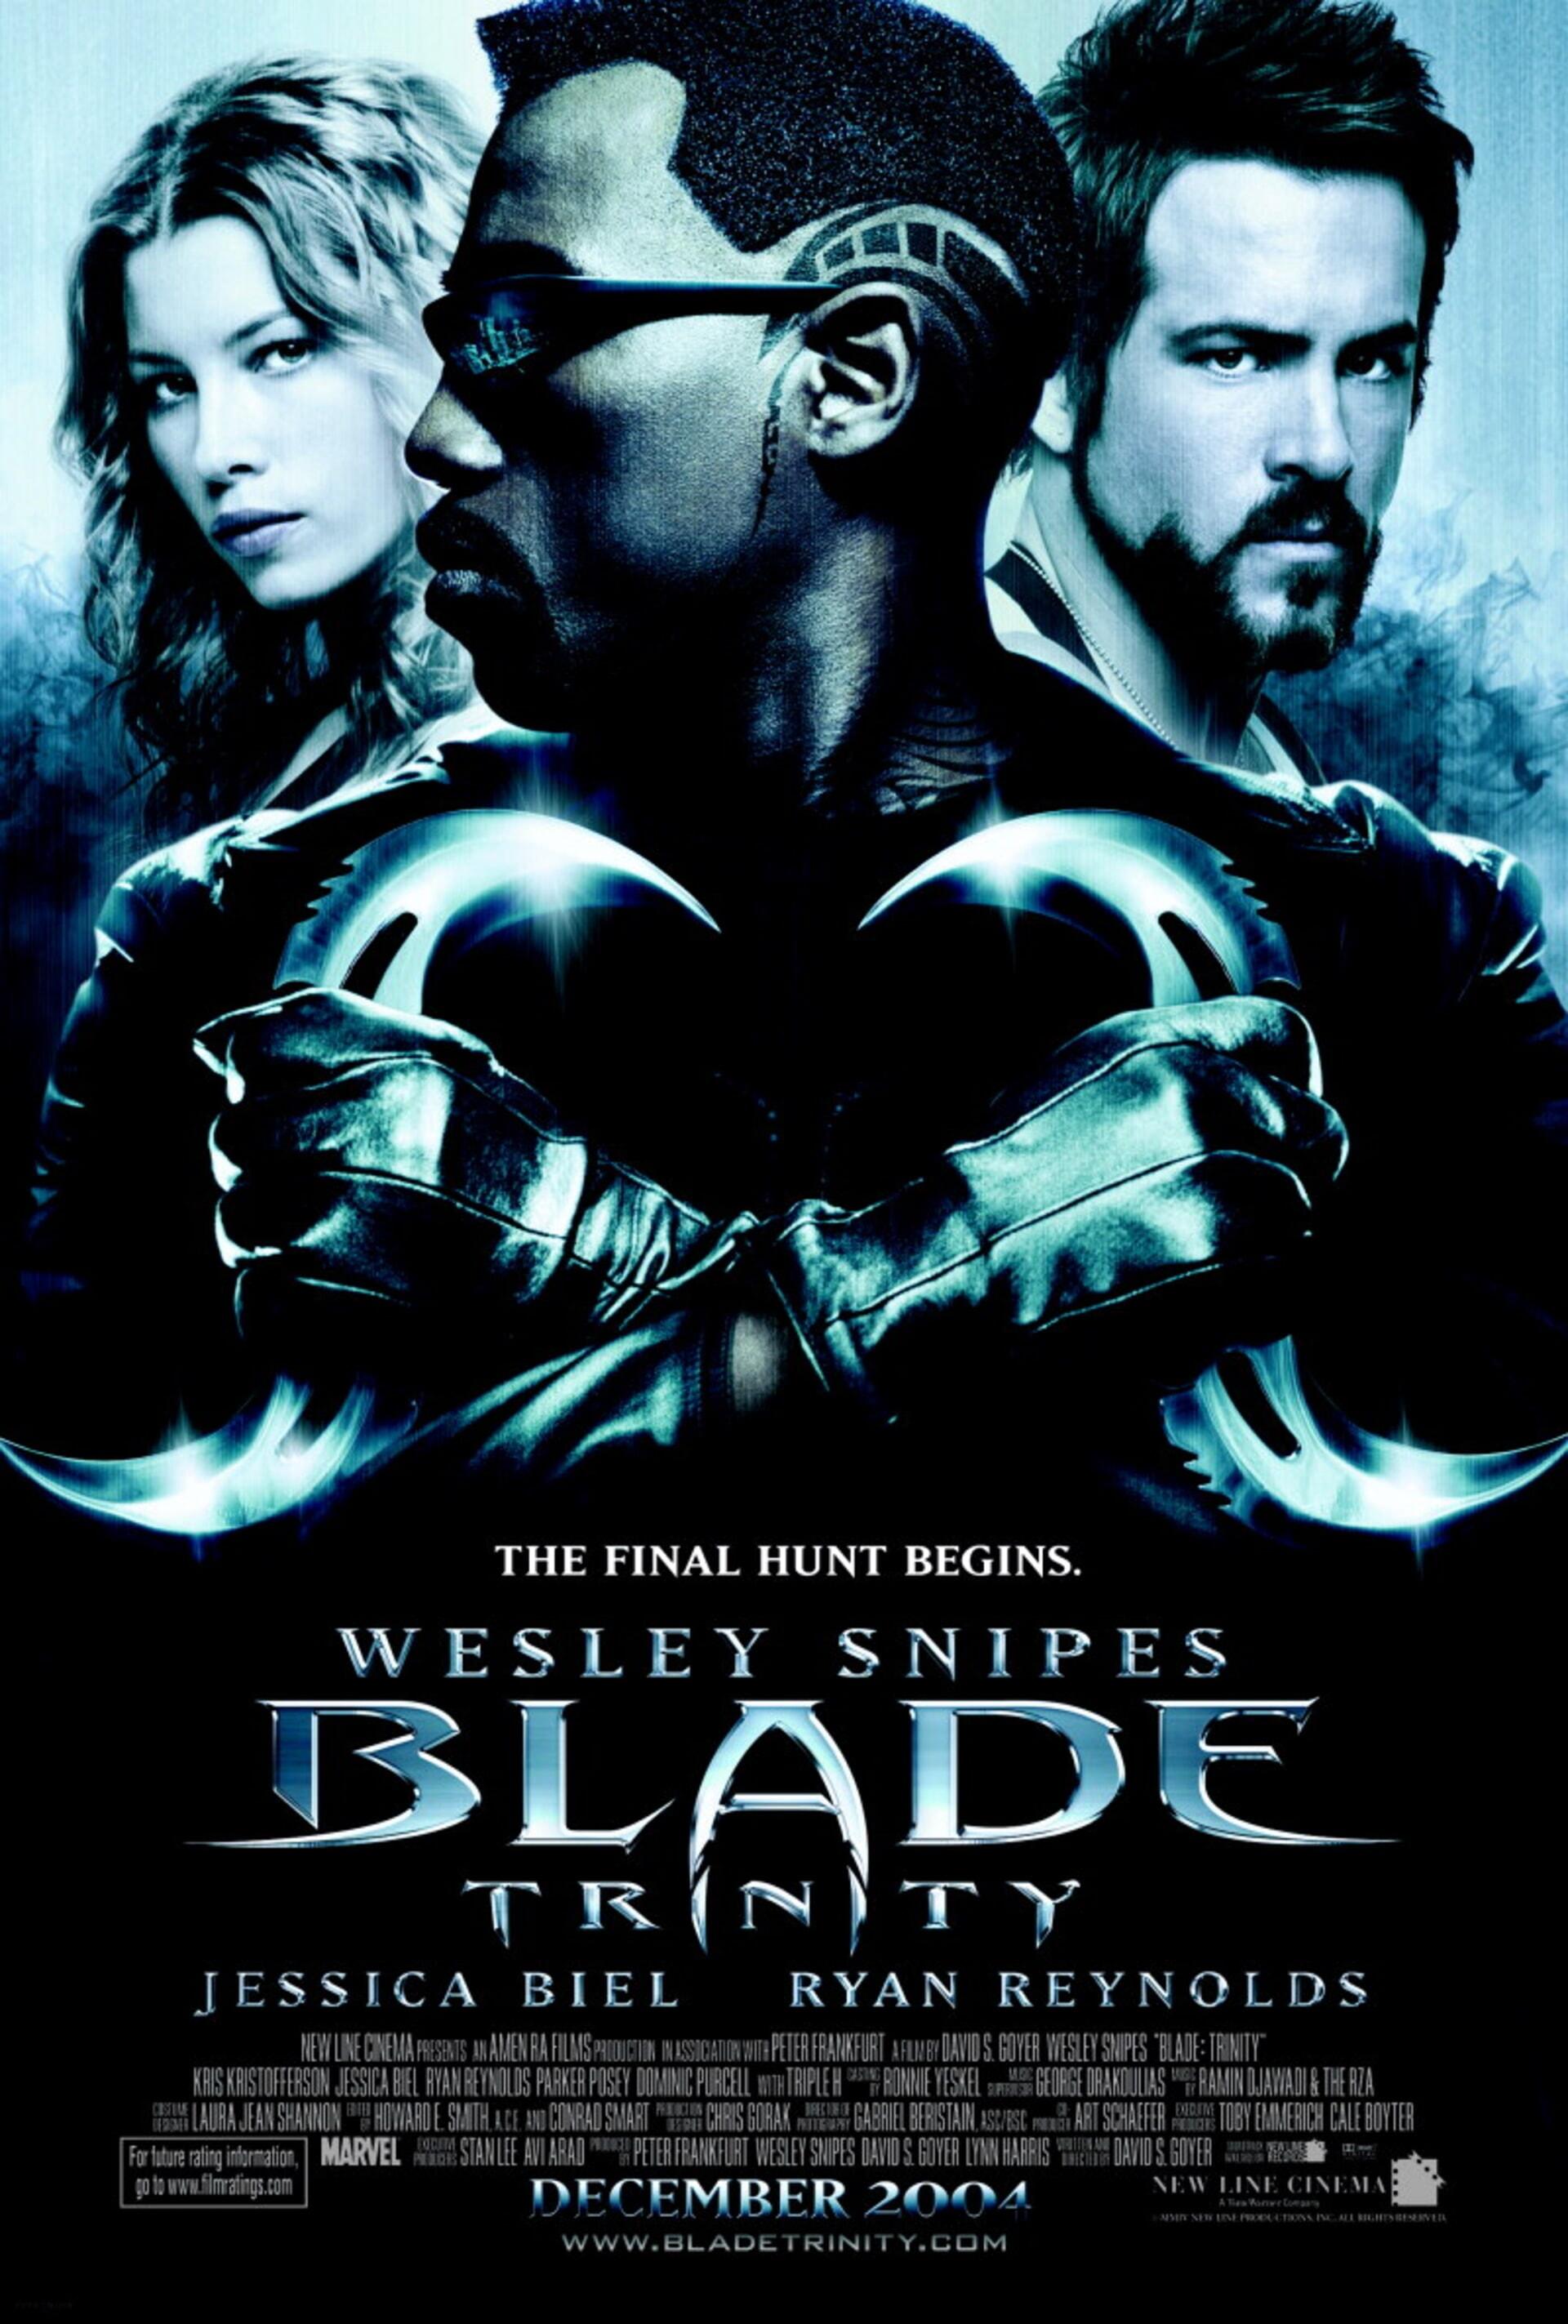 Blade: Trinity - Poster 2